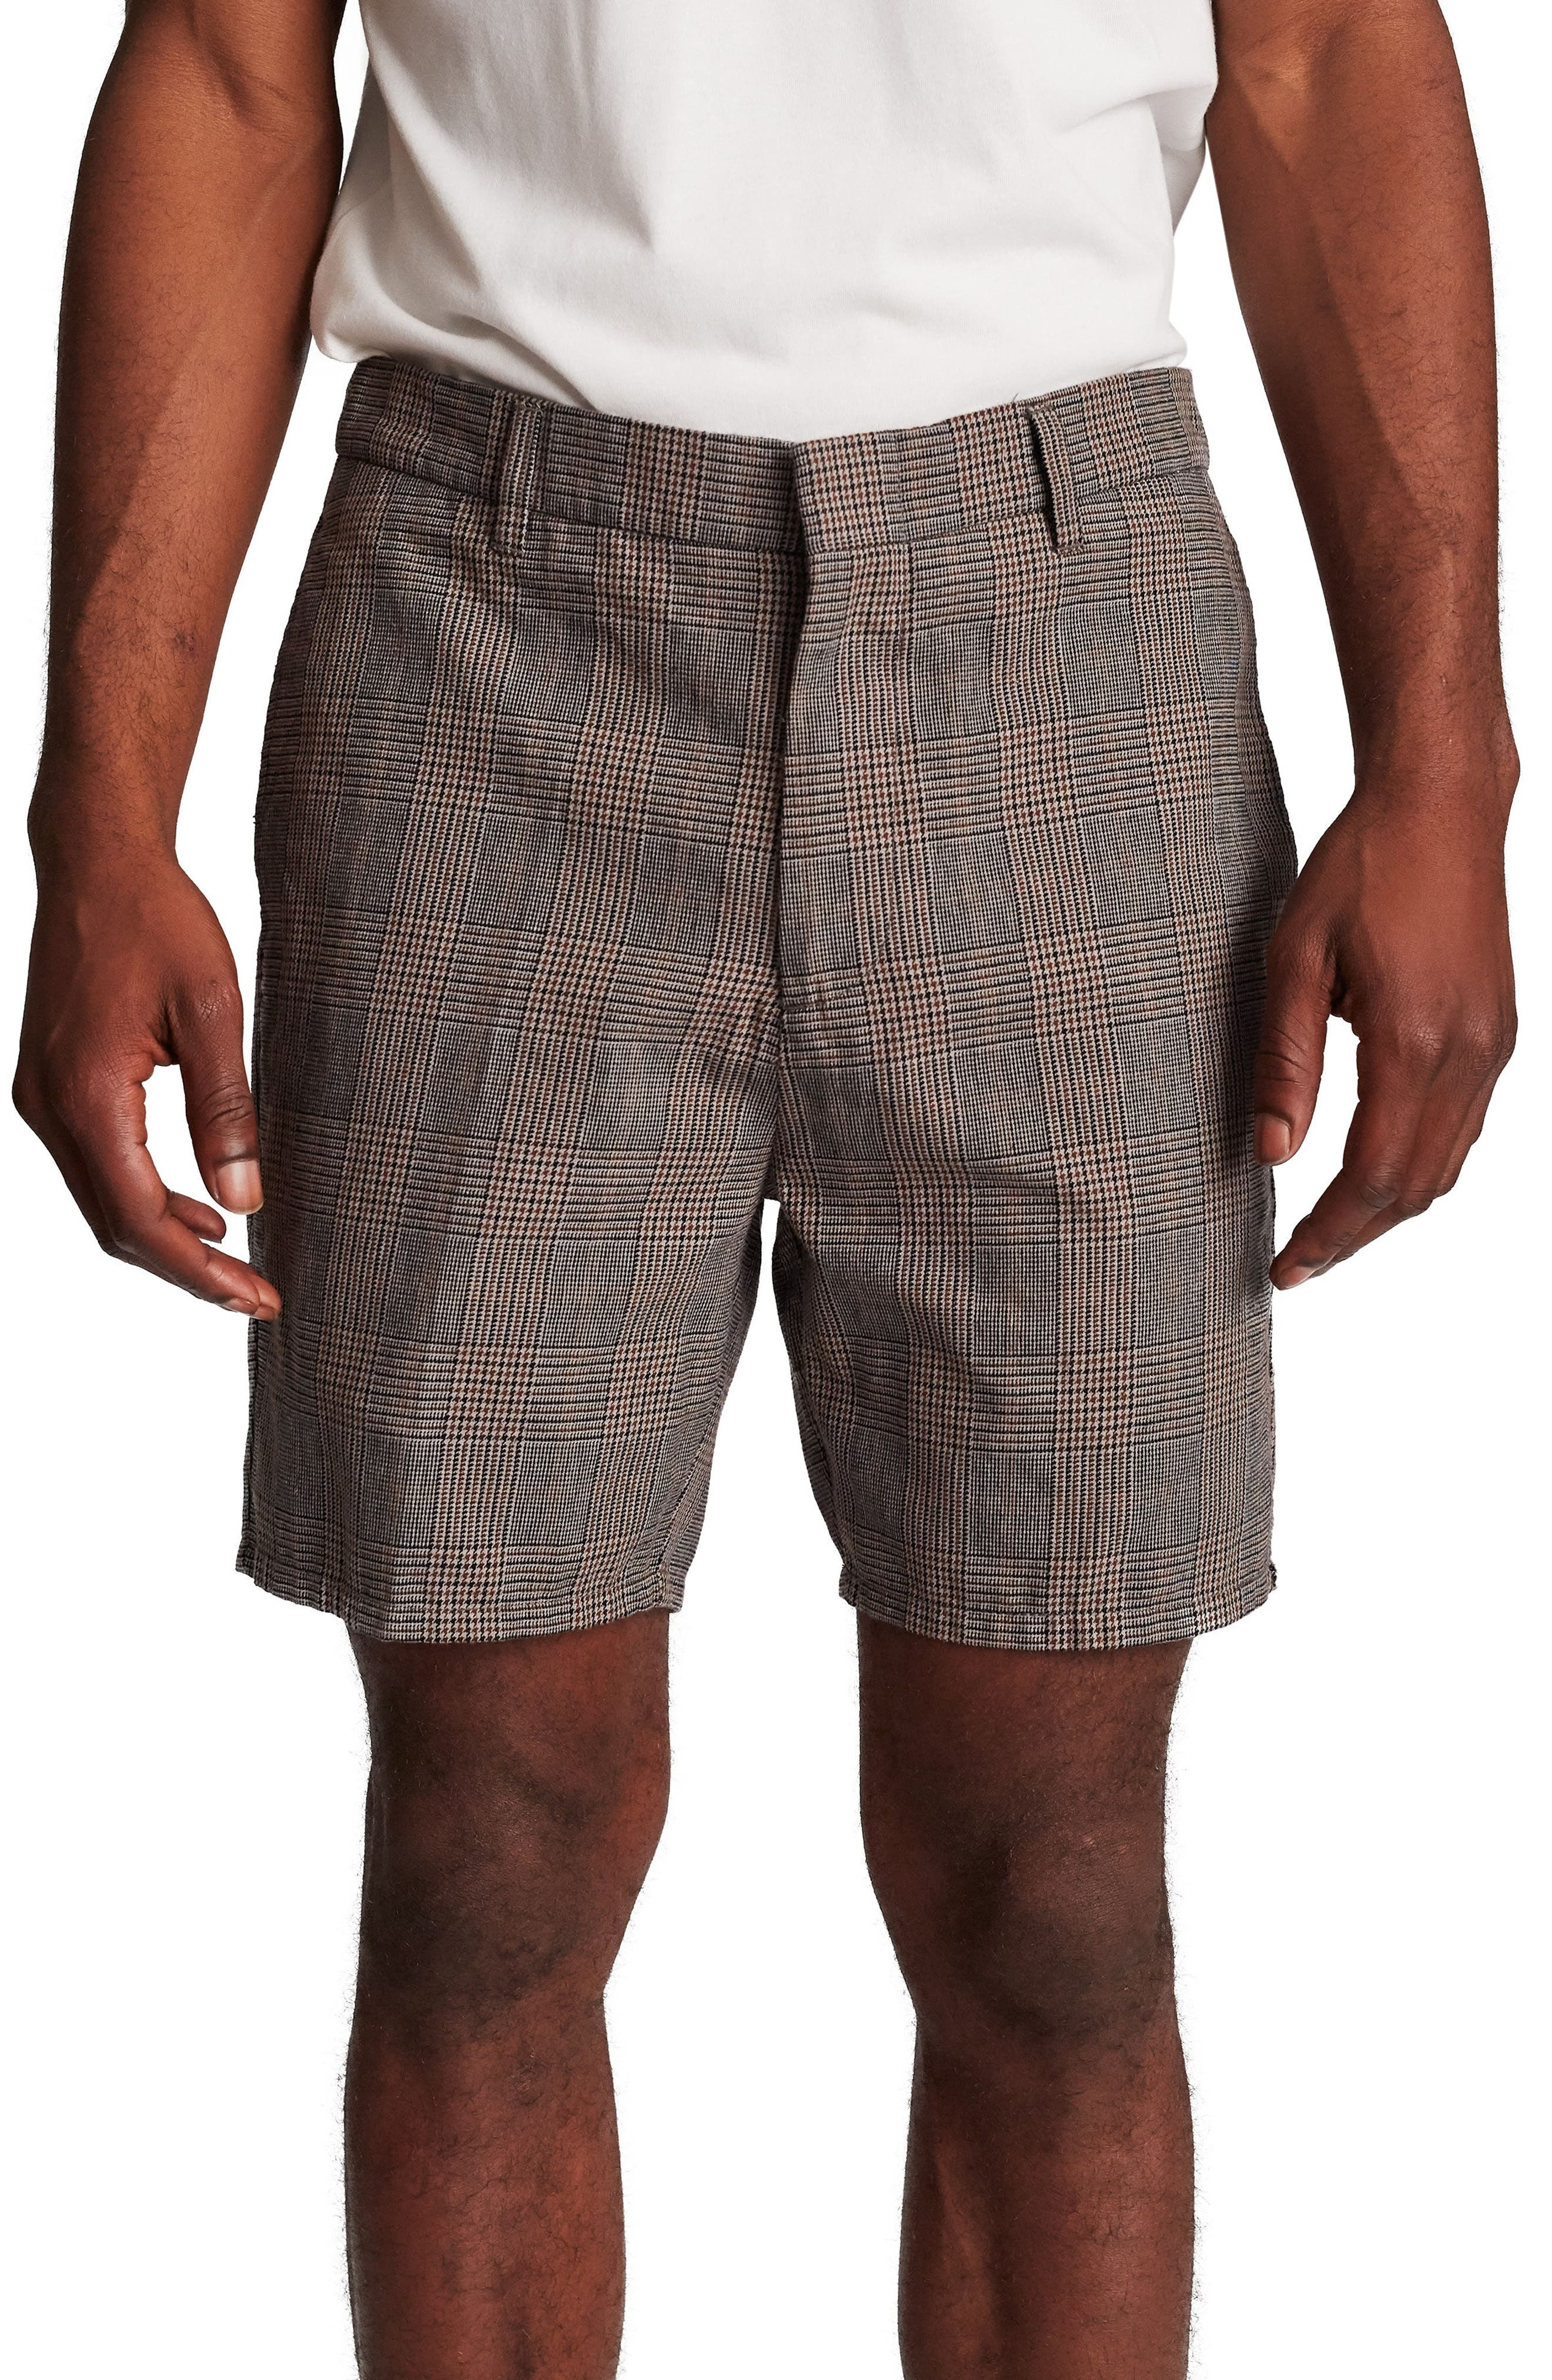 Graduate Slack Shorts,                         Main,                         color, GREY PLAID